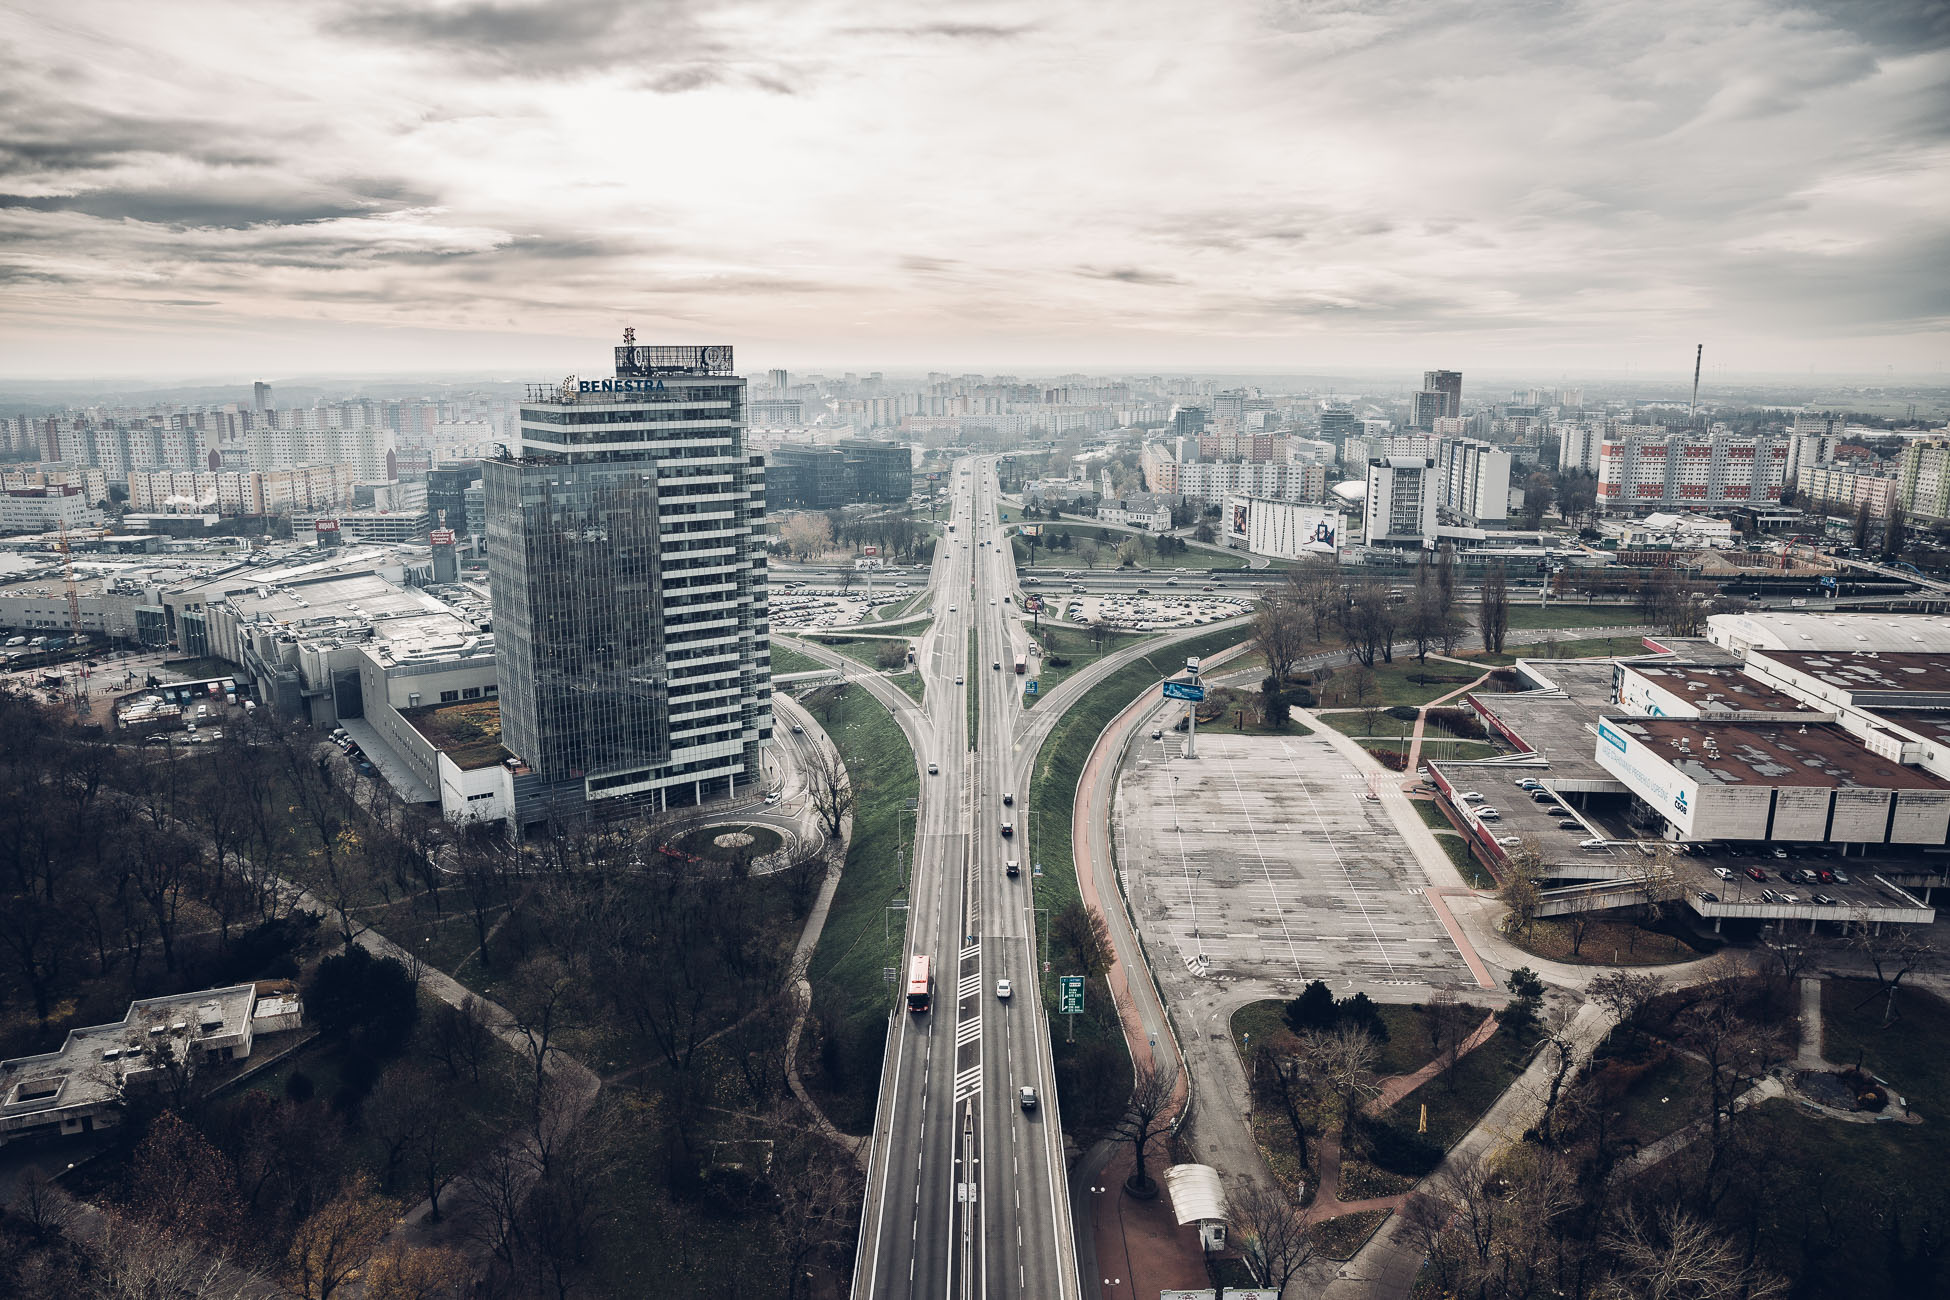 View of Petržalka Bratislava from UFO observation deck